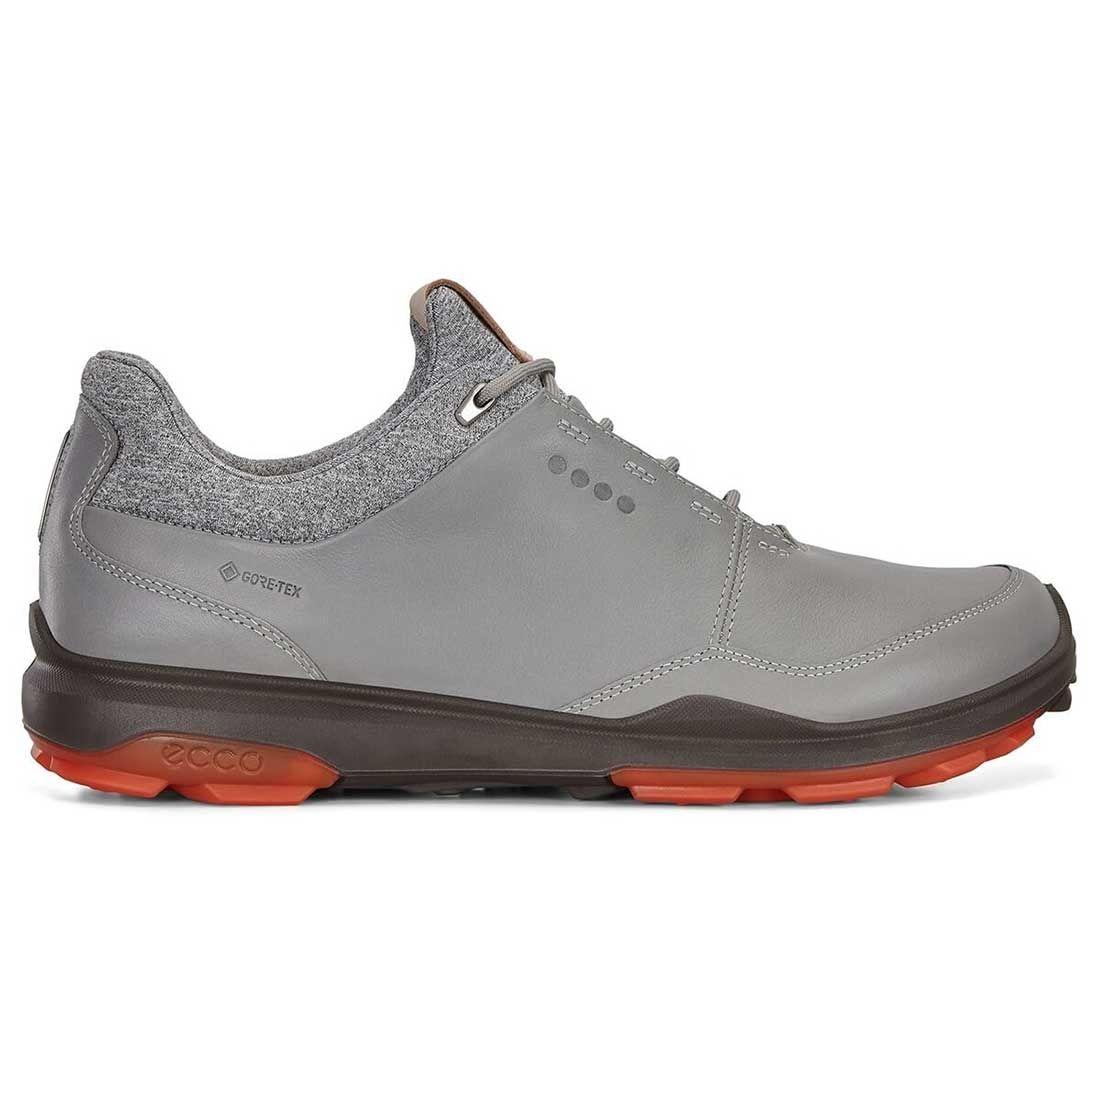 Buy Ecco Biom Hybrid 3 Gtx Golf Shoes Wild Dove Fire Golf Discount